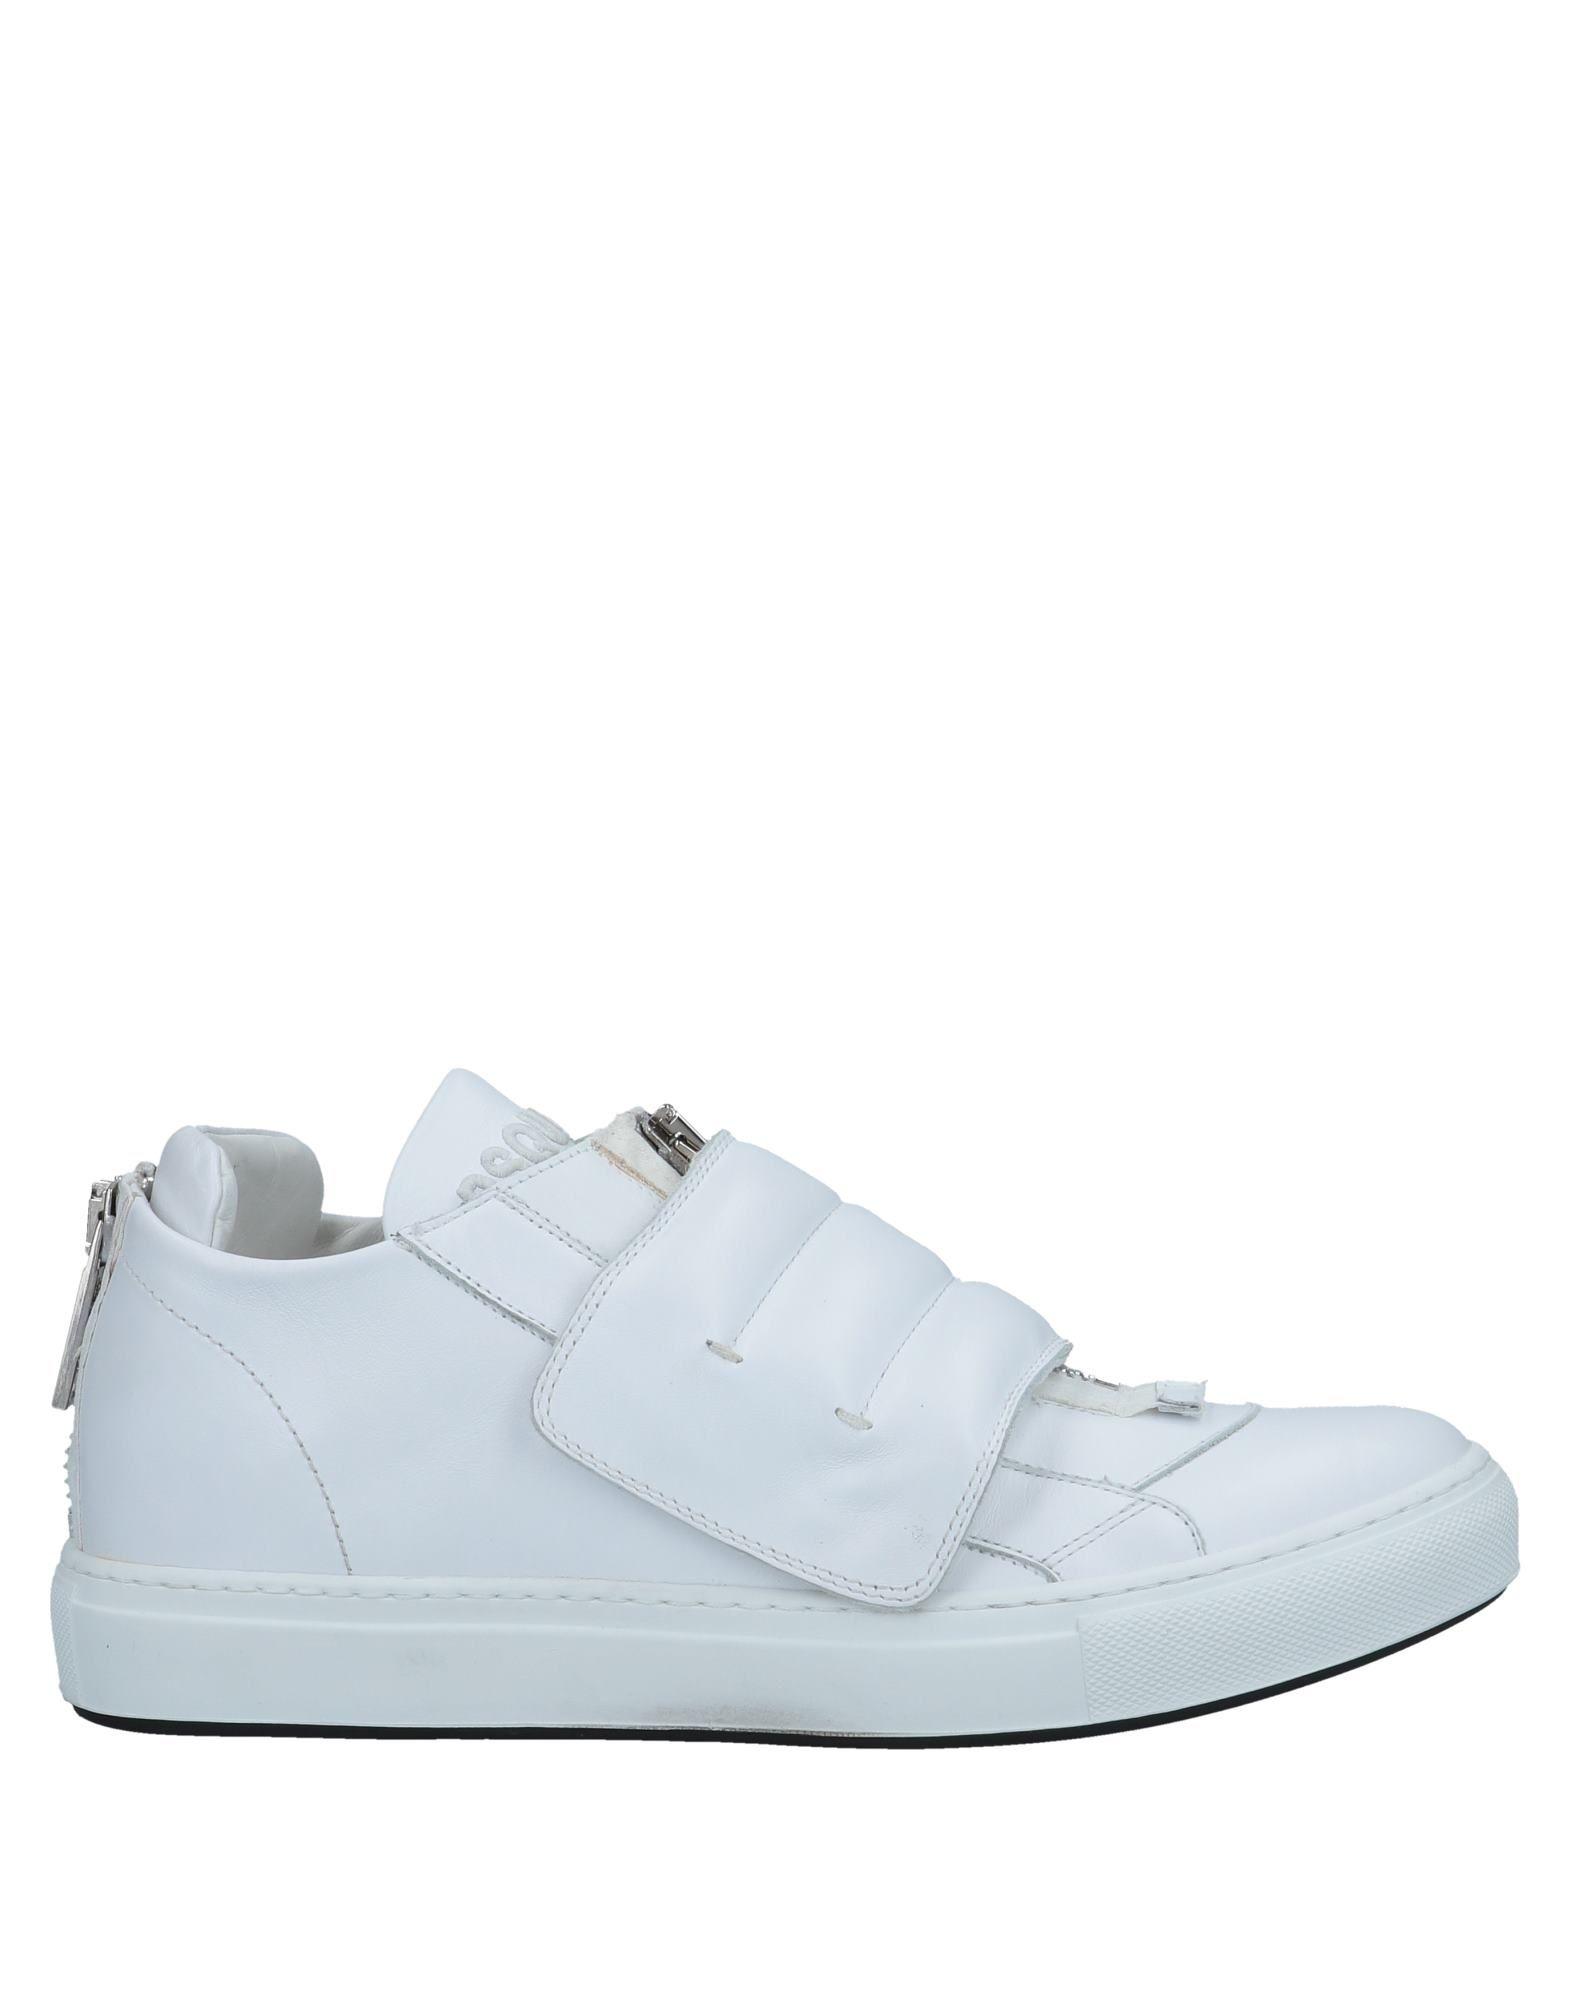 Dsquared2 Sneakers Herren  11259280PQ Gute Qualität beliebte Schuhe